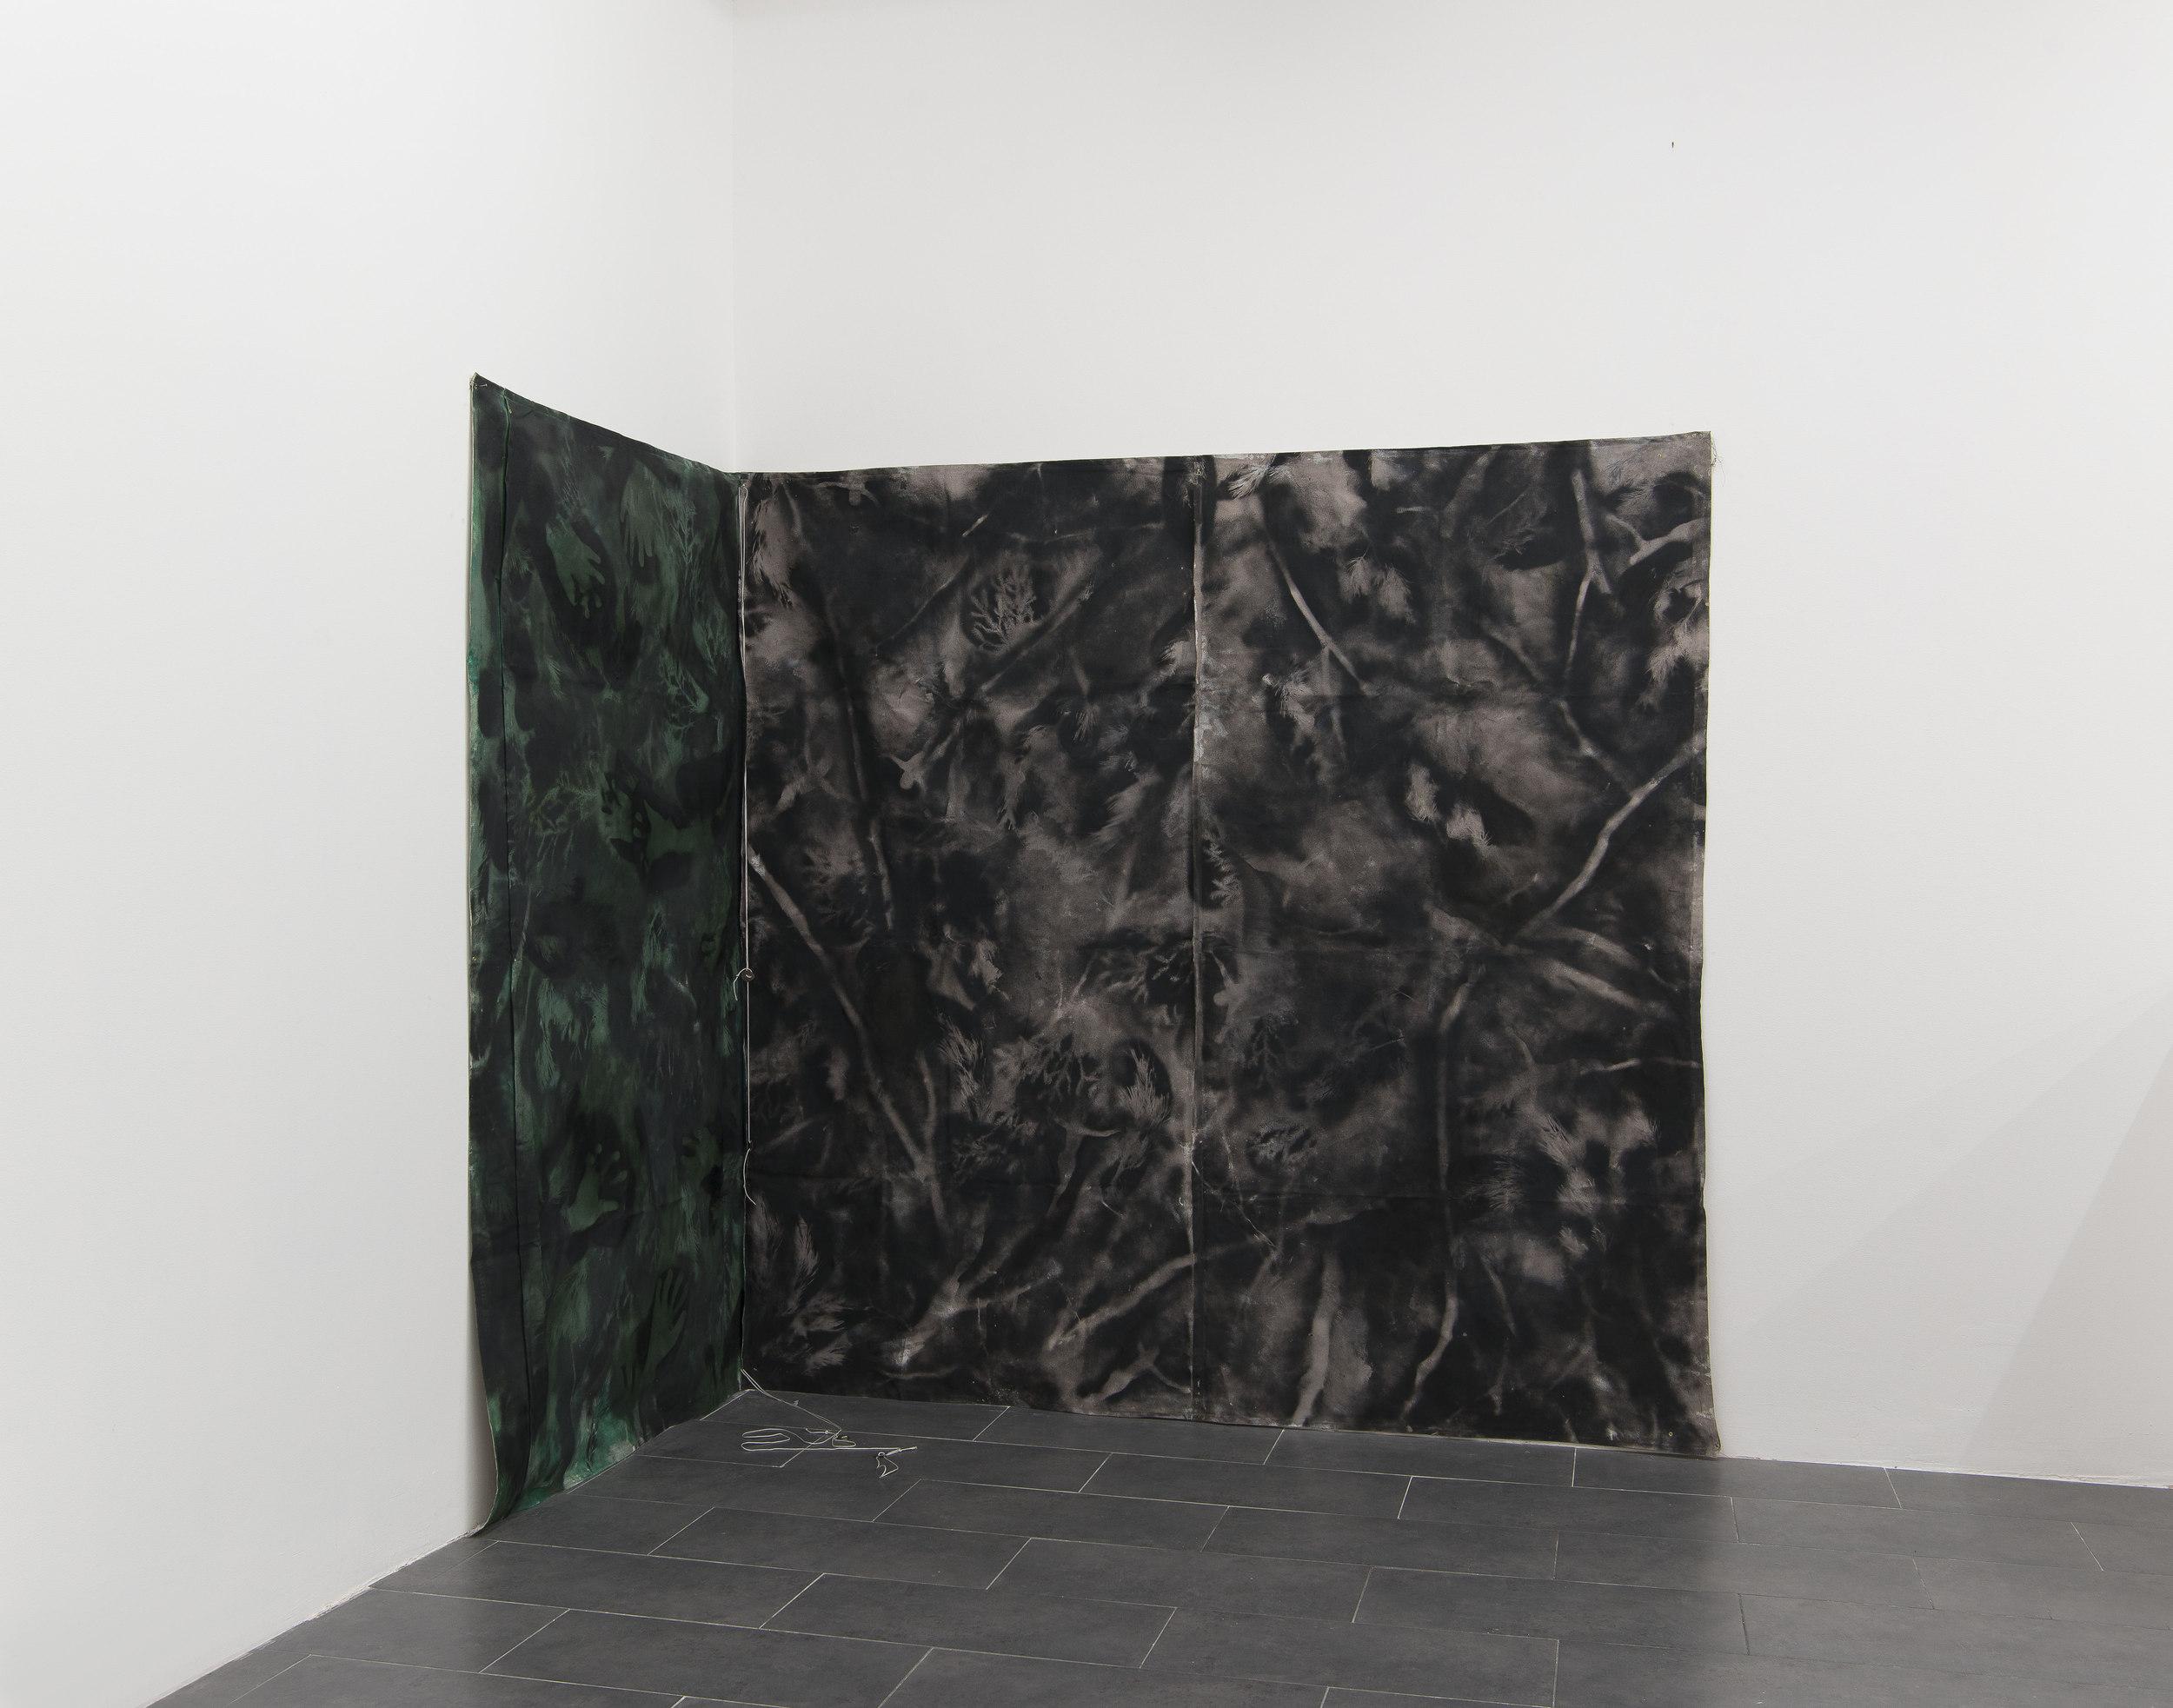 Marius Engh, Tent Painting #3, 2018, Spray Charcoal, Spray Paint, Acrylic Paint,